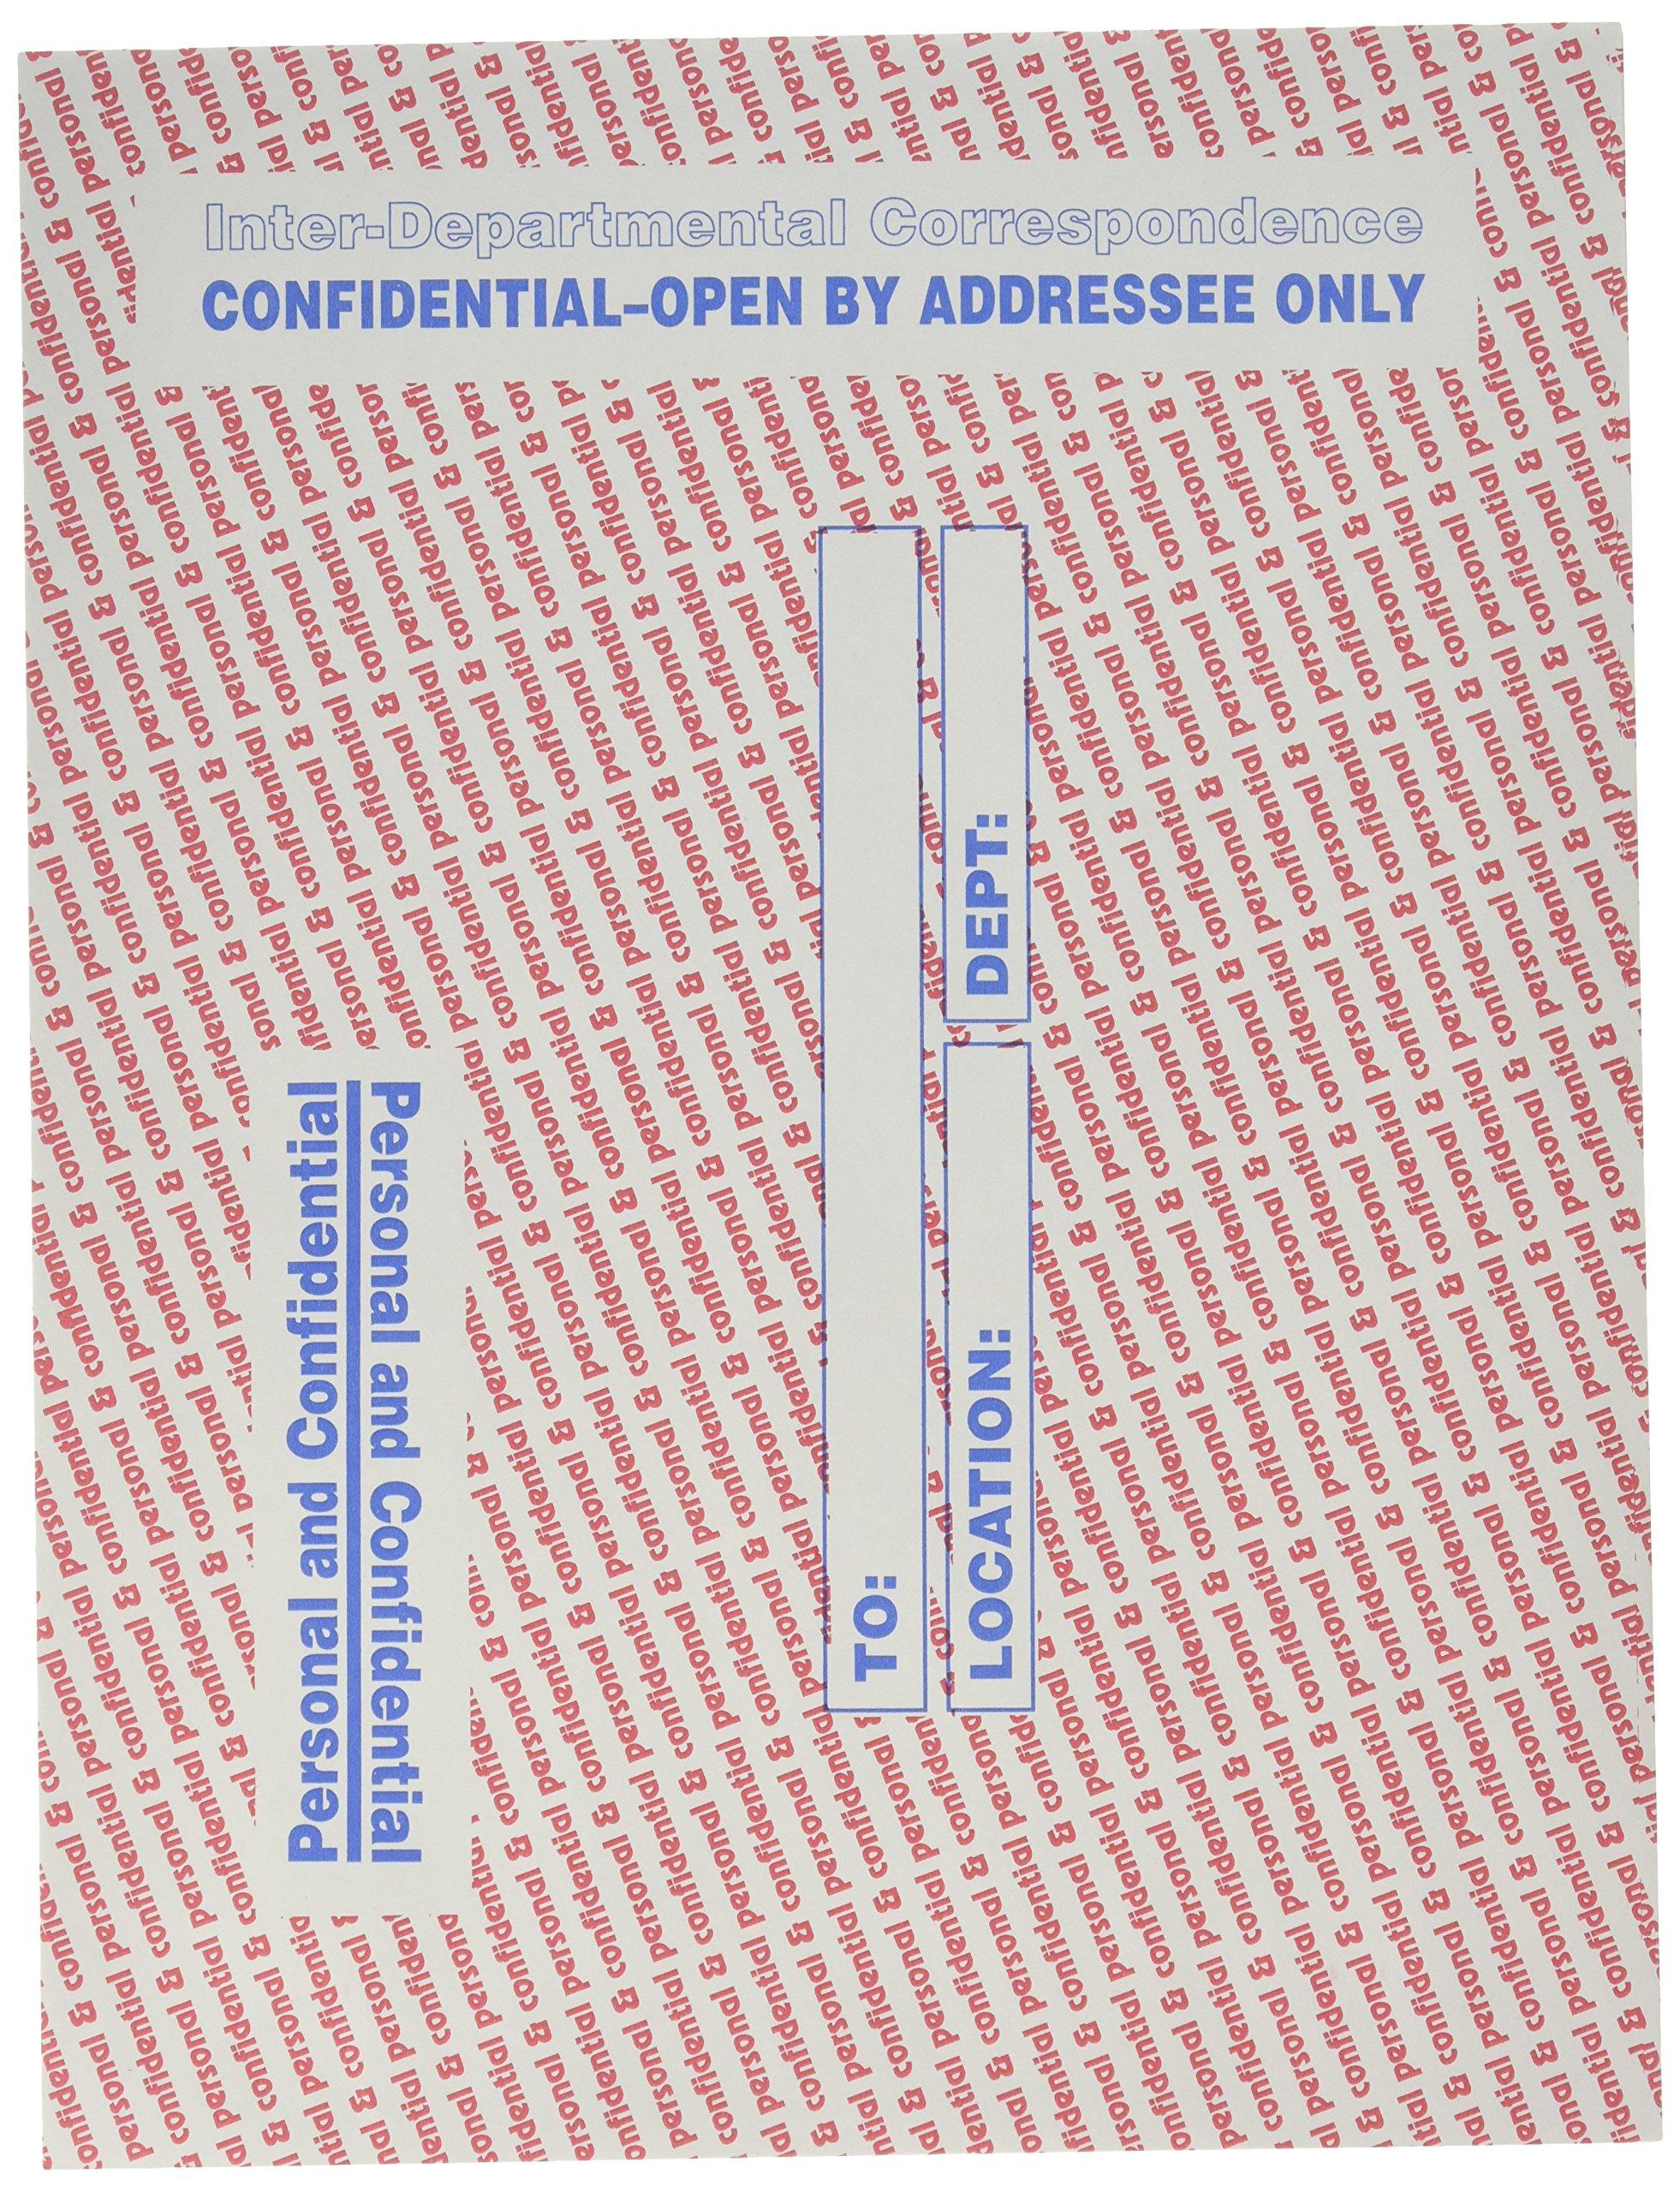 Quality Park Interdepartmental Envelopes, 10 x13, Gray, (QUA63778) 100 count.